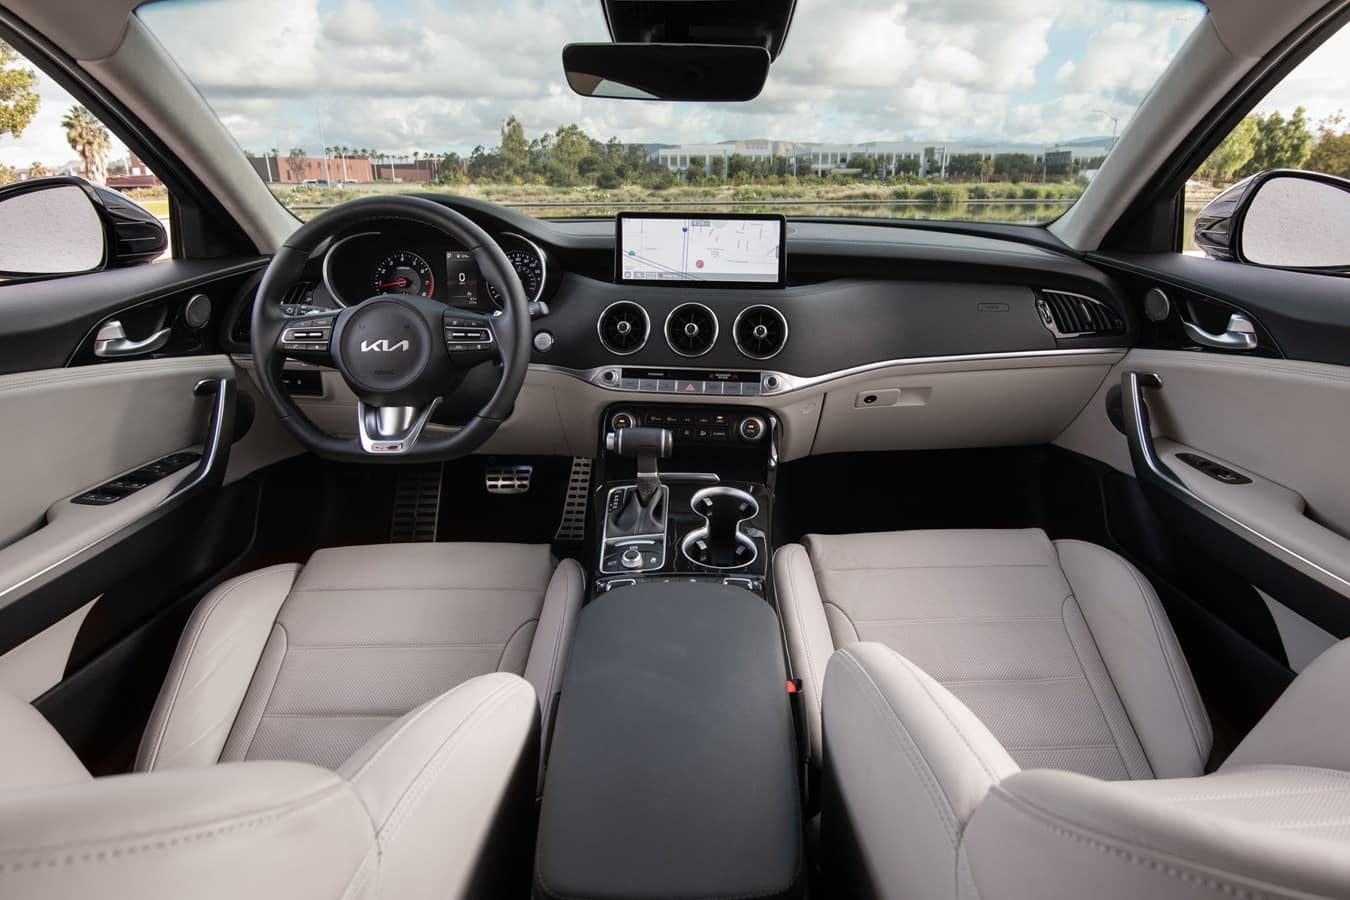 2022 Kia Stinger interior Cowboy Kia